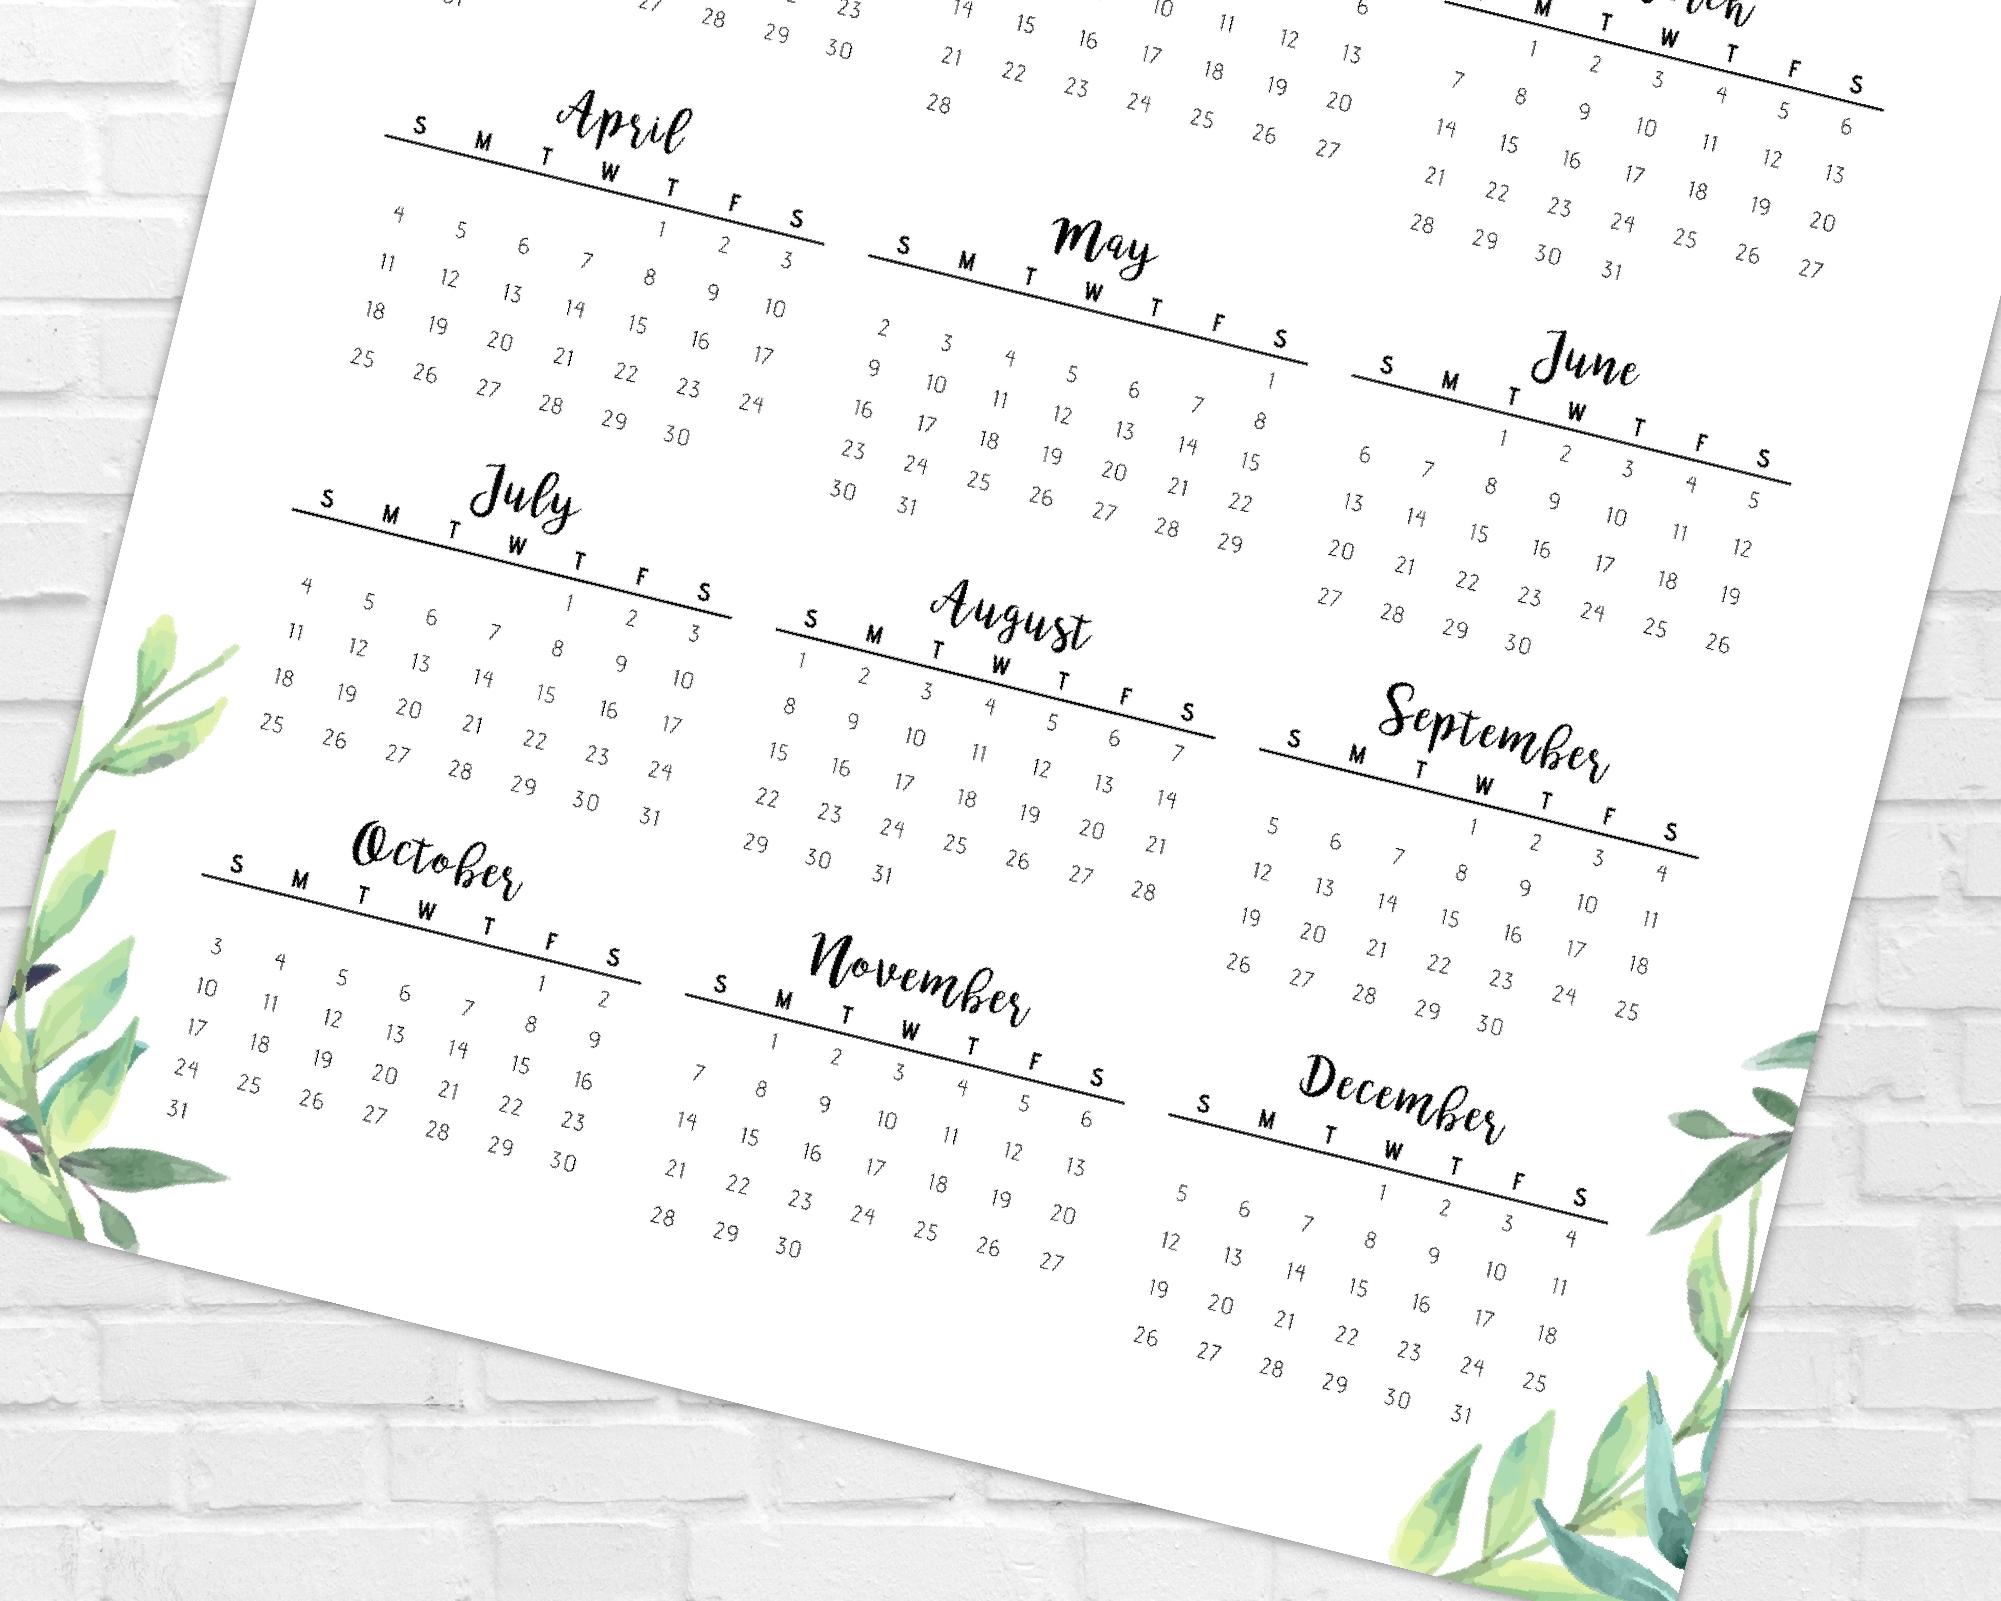 2021 Year At A Glance Calendar   Greenery & Leaves